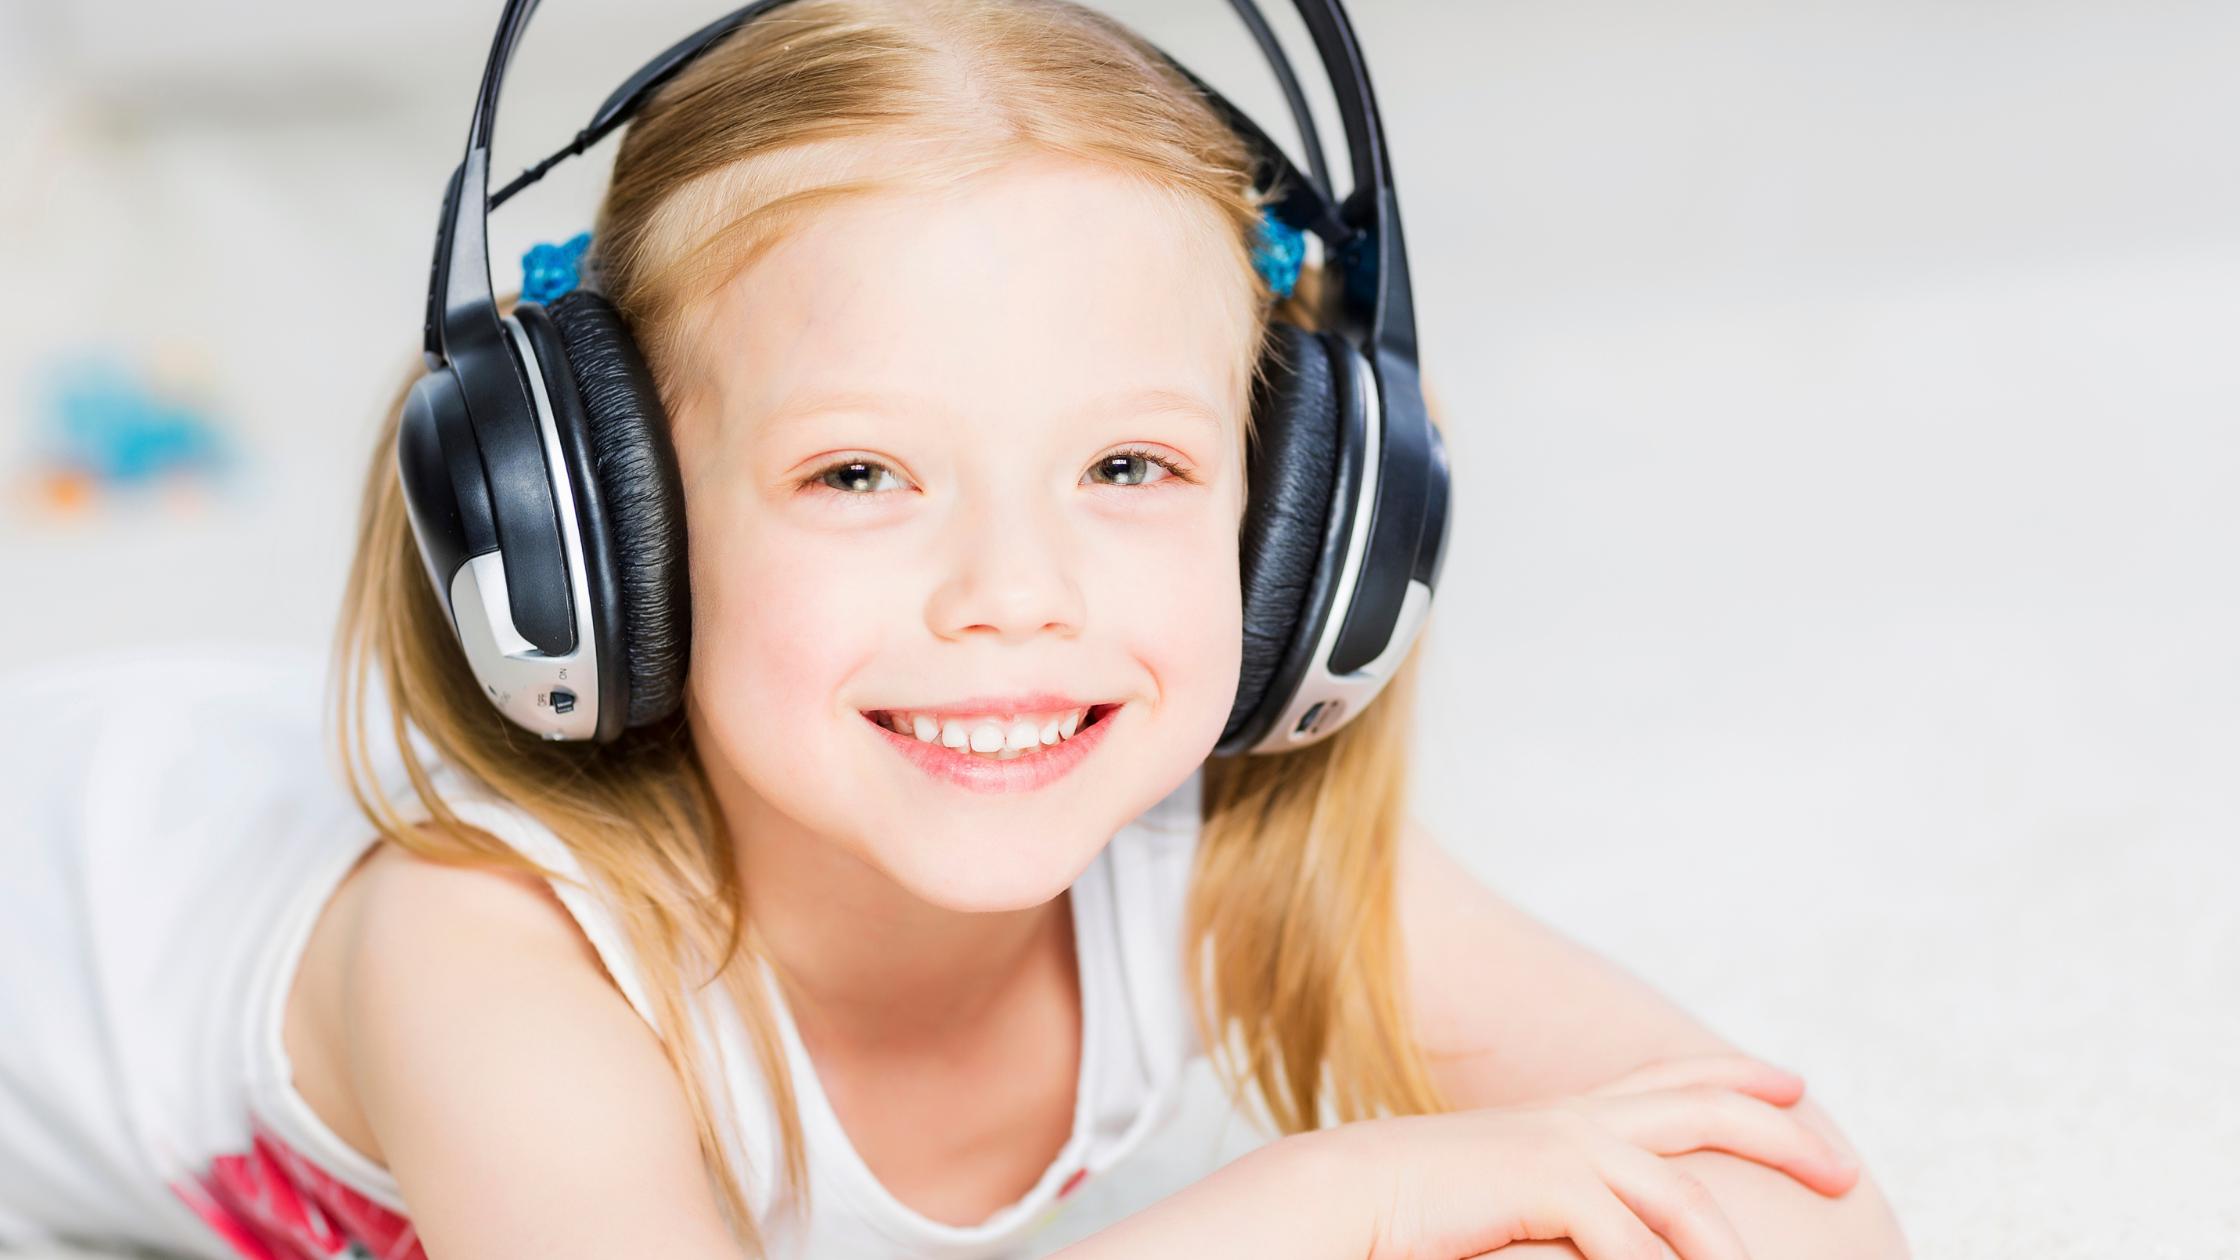 child with headphones on